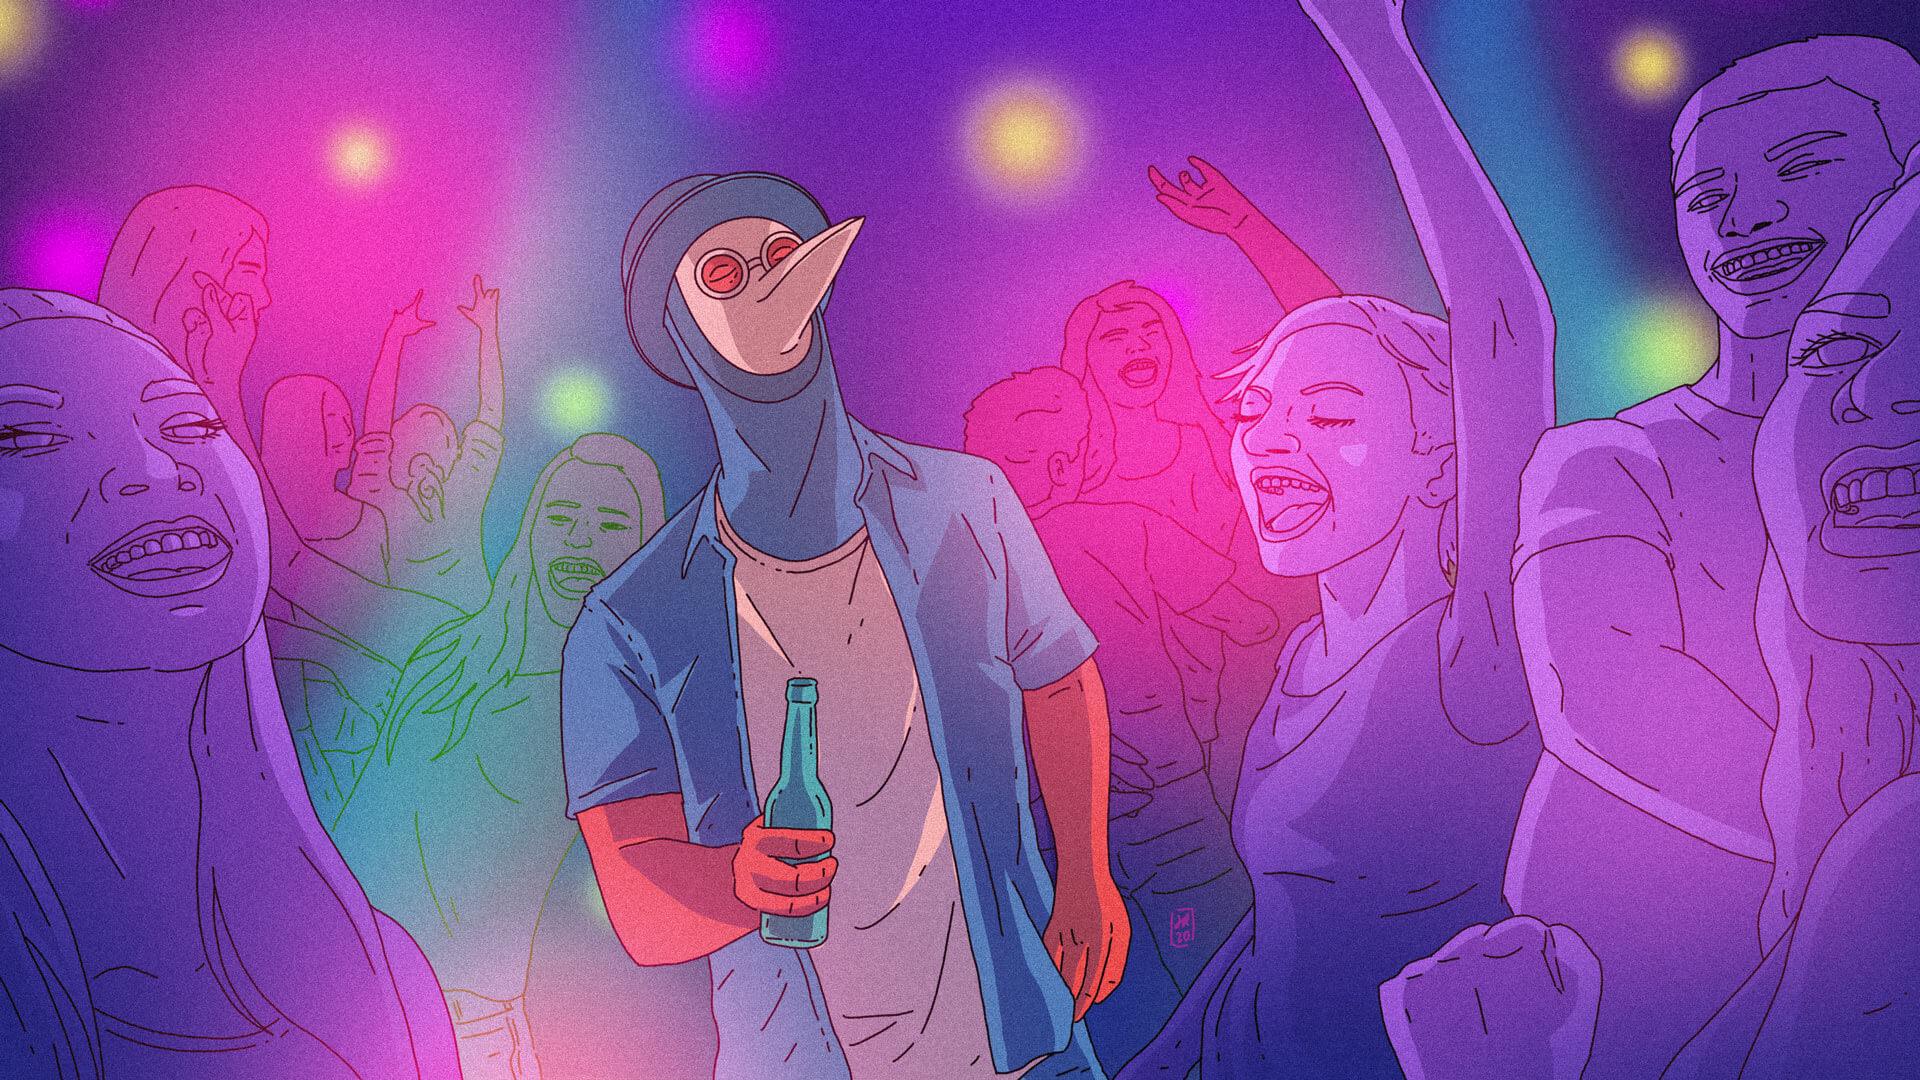 CoronaBlog | Día treintaitrés: la última fiesta